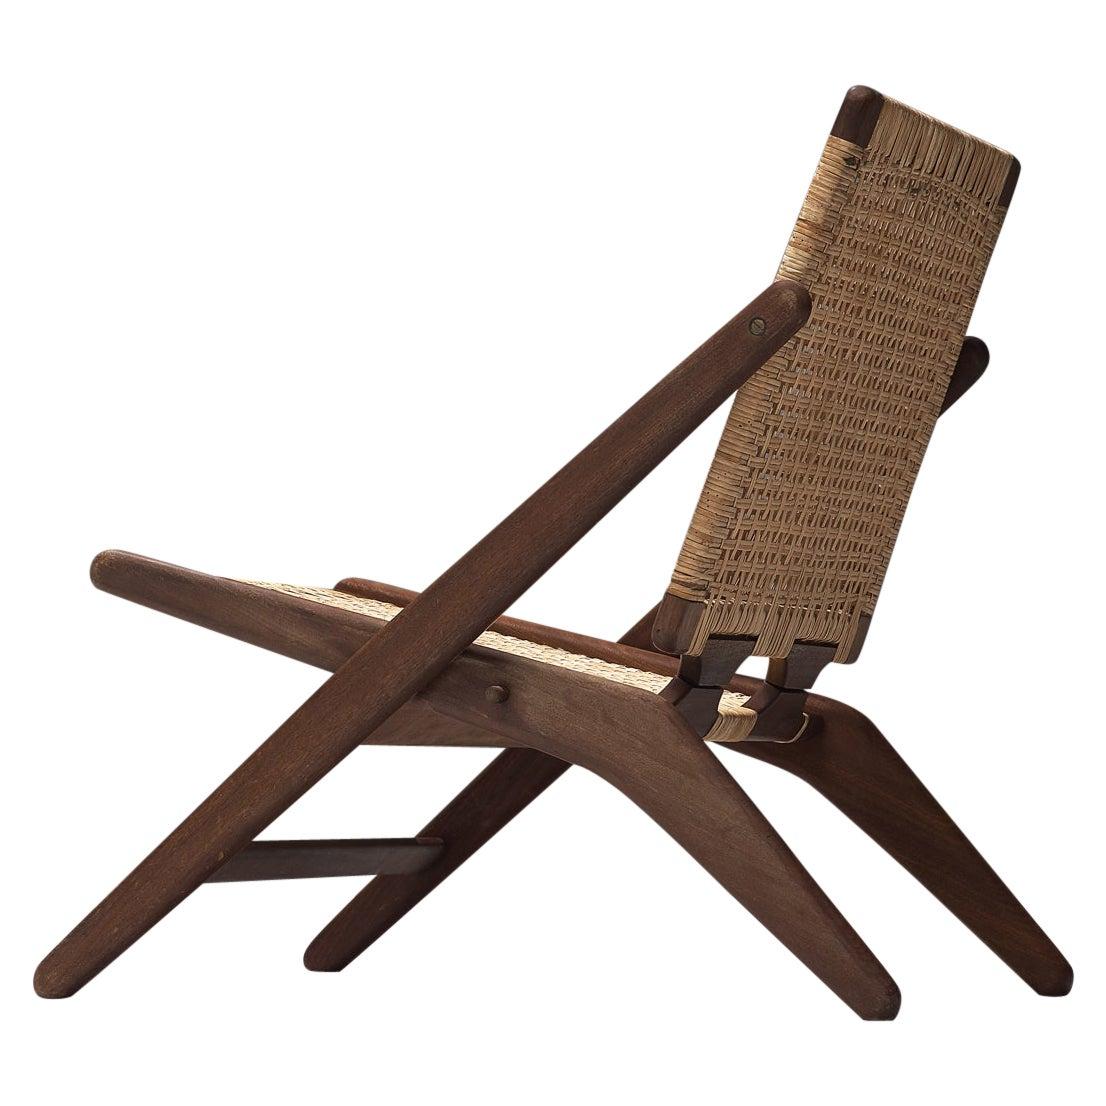 Danish Easy Chair in Wood and Wicker by Arne Hovmand-Olsen